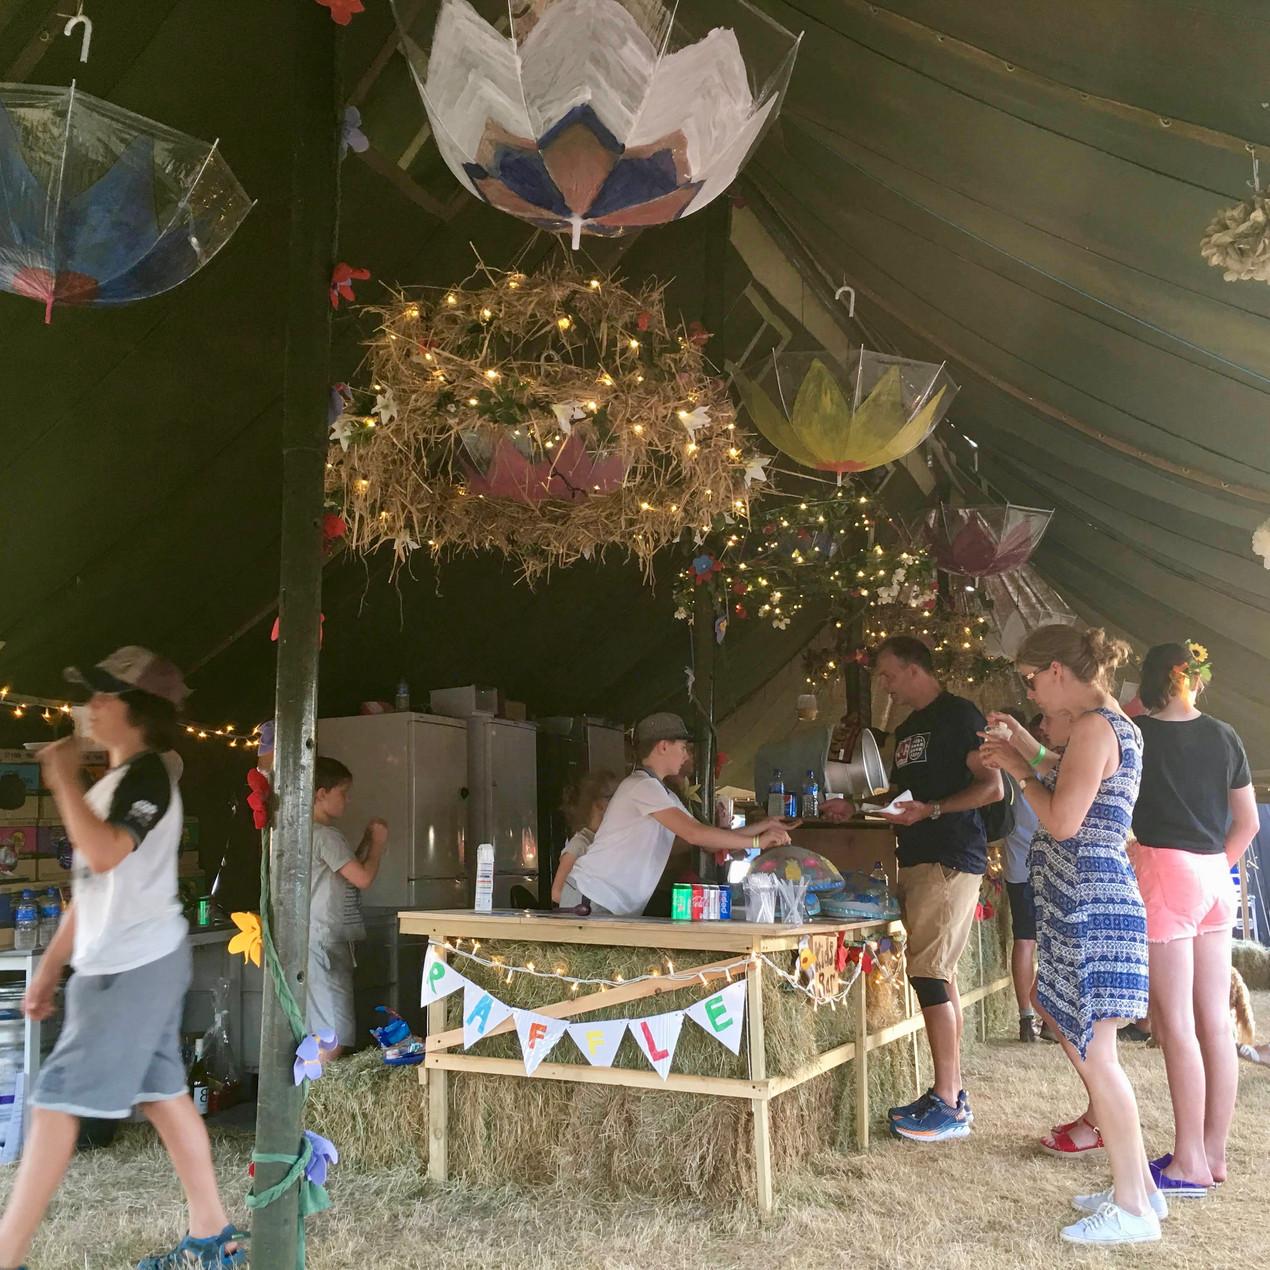 The fabulous bar at Littlefest 2018